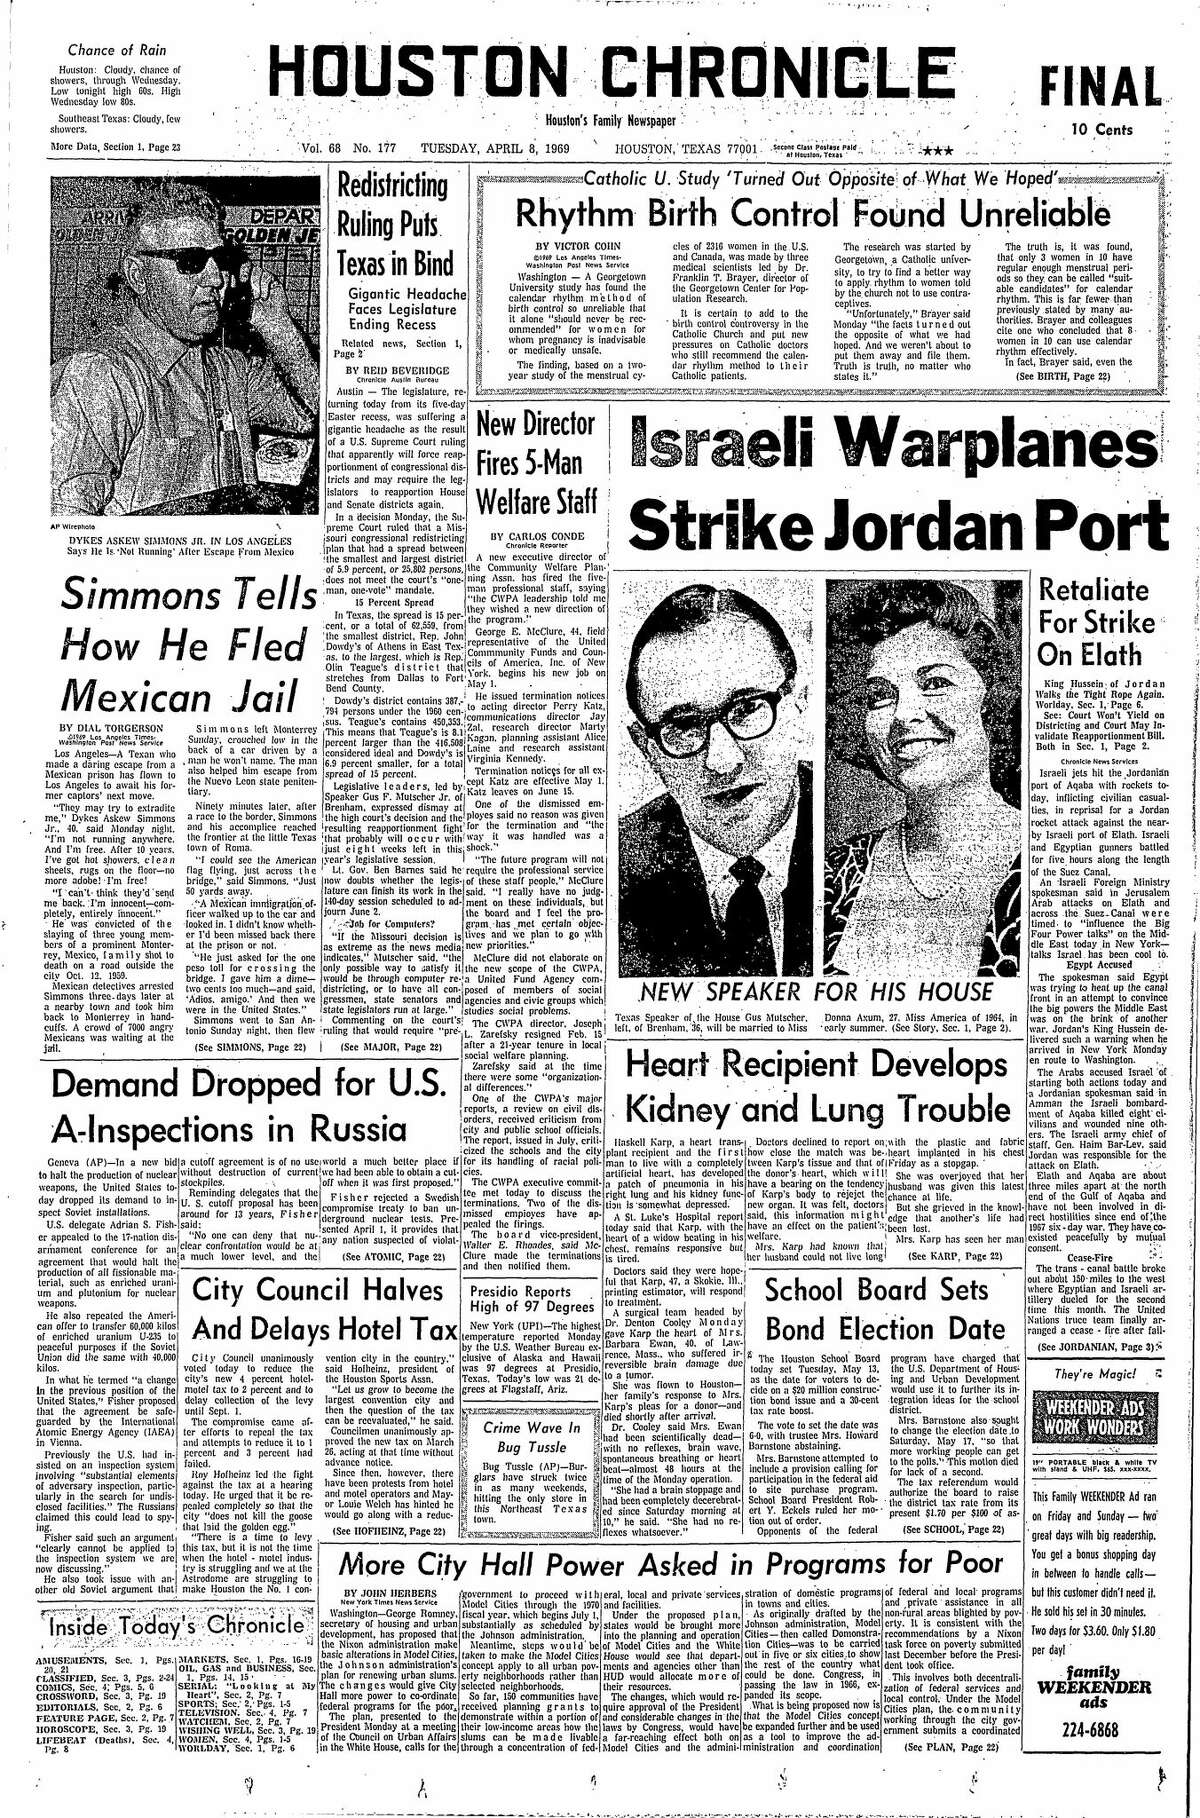 April 8, 1969